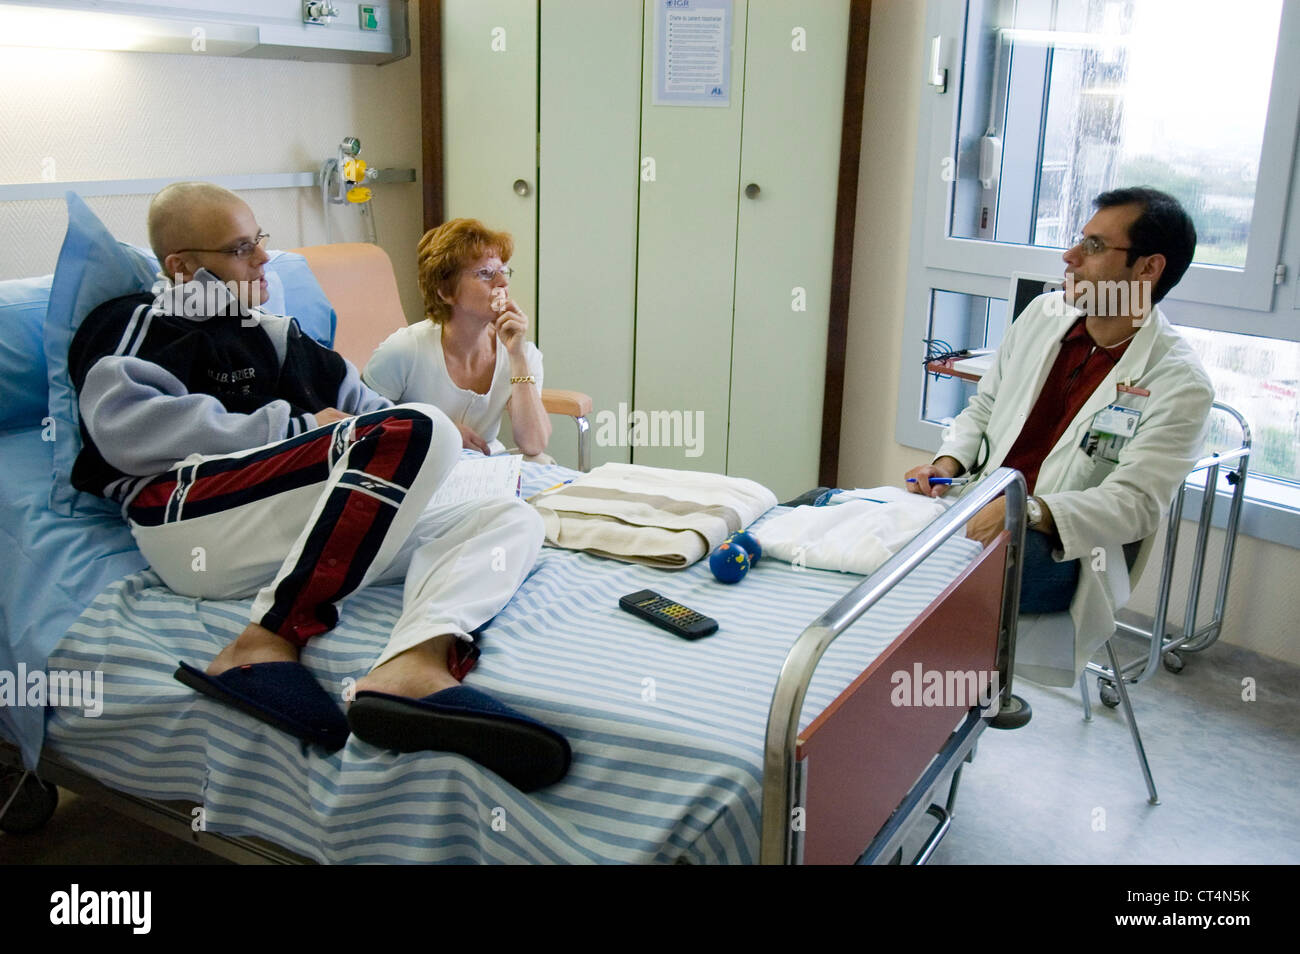 CANCER, MAN Stock Photo: 49276911 - Alamy